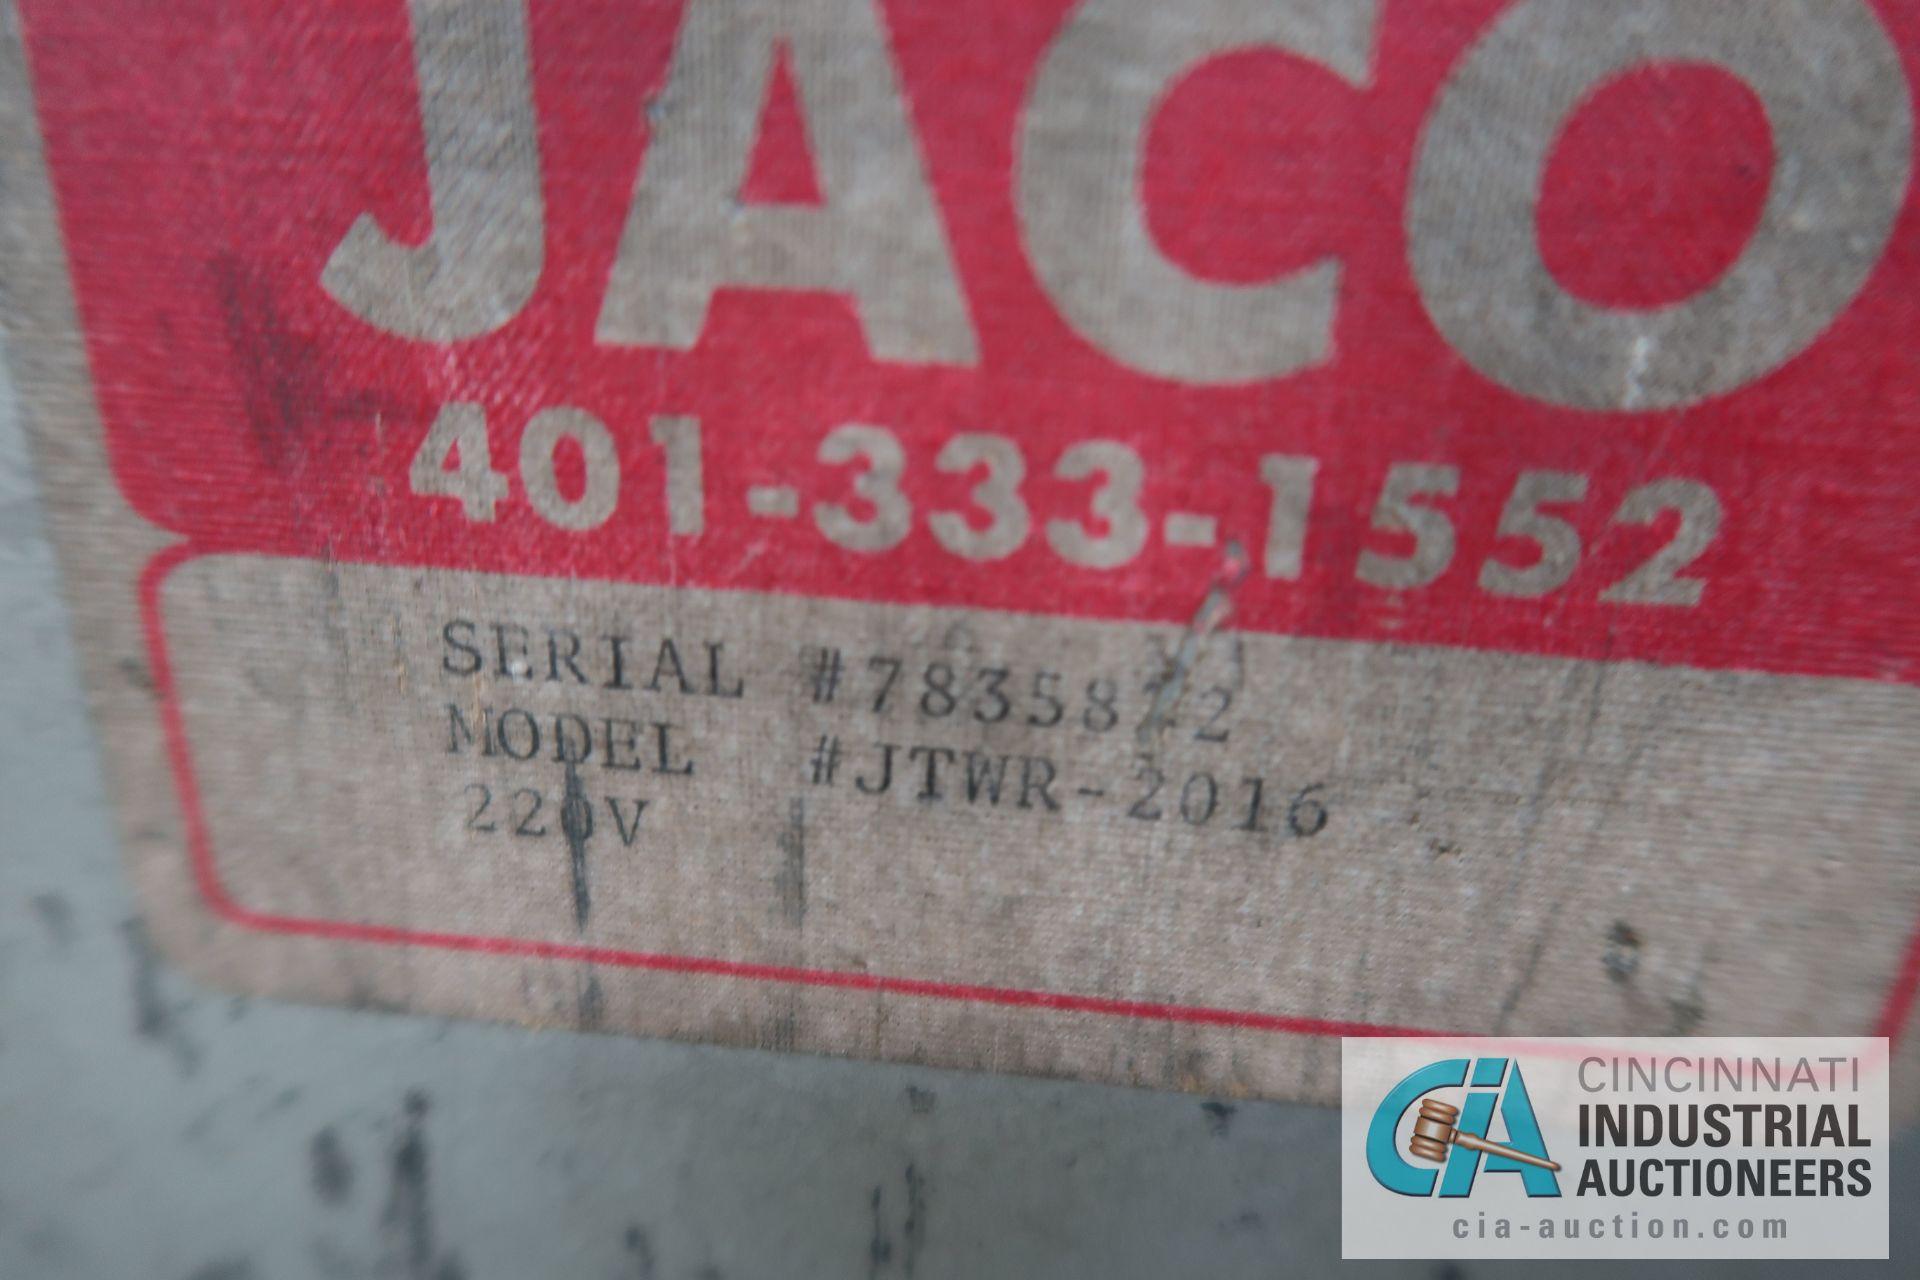 2,000 LB. CAPACITY JACO MODEL JTWR-2016 COIL REEL; S/N 783582 - Image 4 of 4